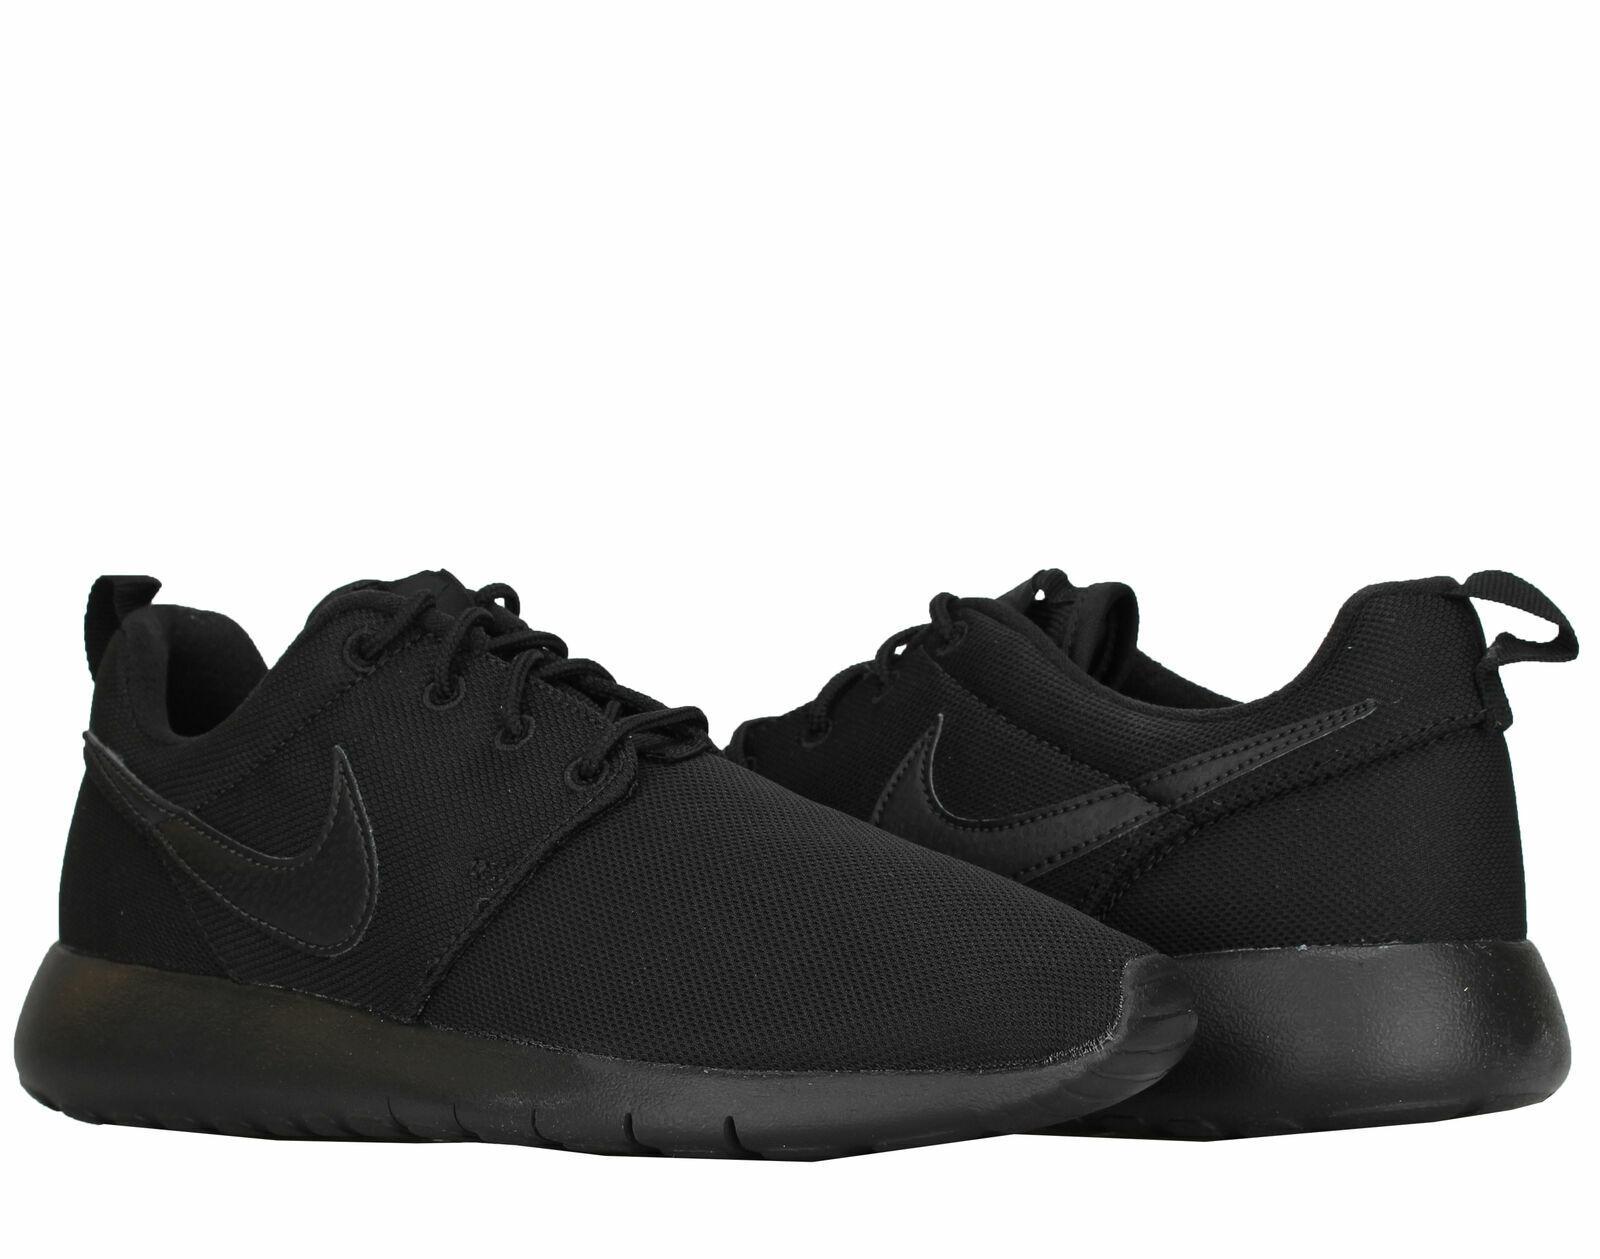 New Nike Huarache Run Print GS Kids Running Shoes 704943-002 Black White Youth